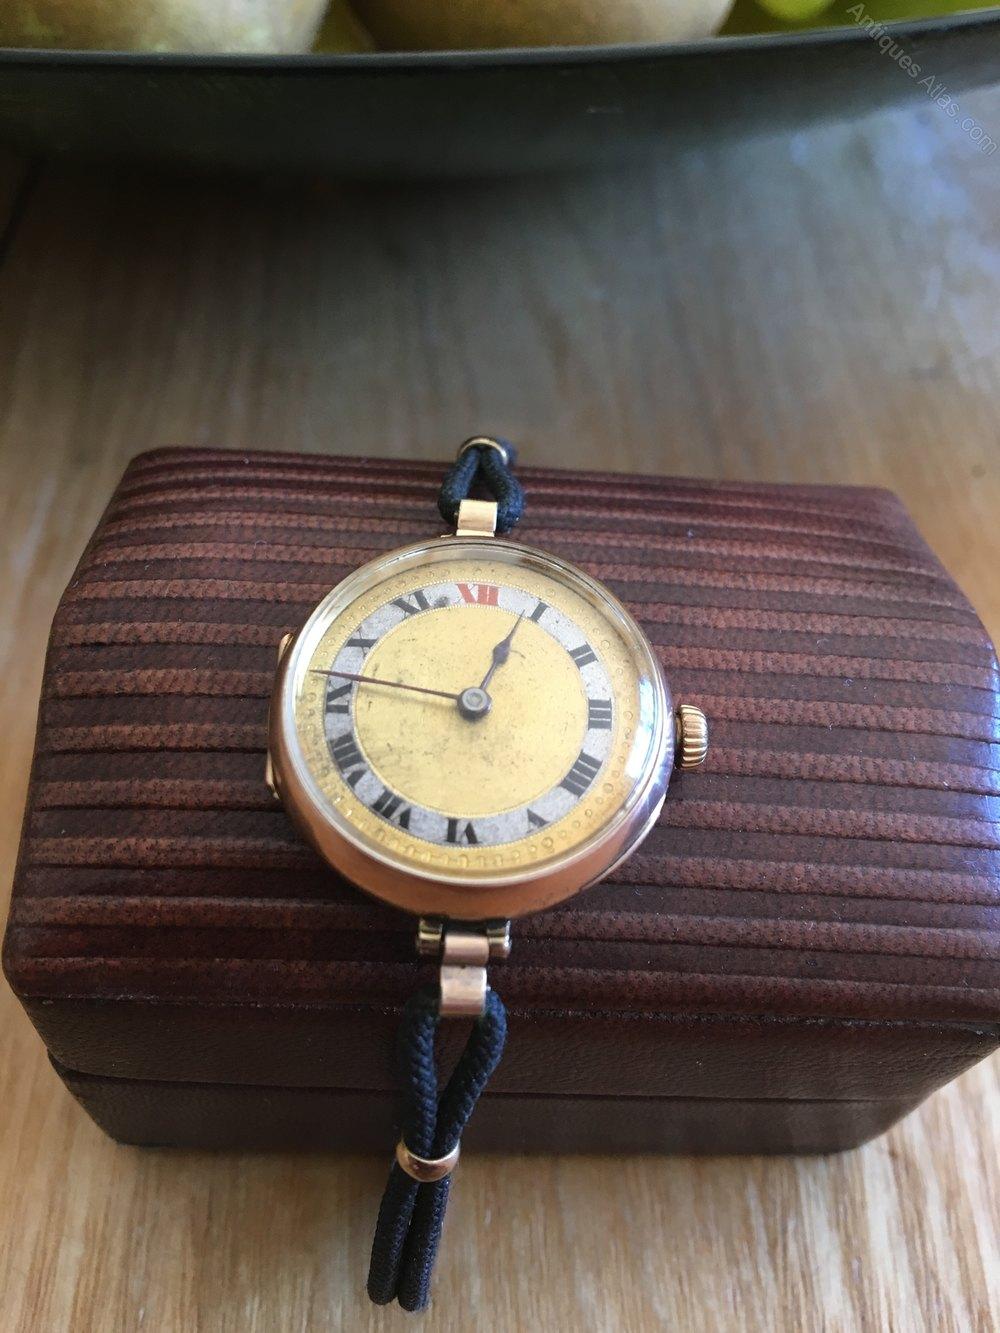 Rolex Prices Uk >> Antiques Atlas - Ladies 9ct Gold Rolex Watch Made 1949